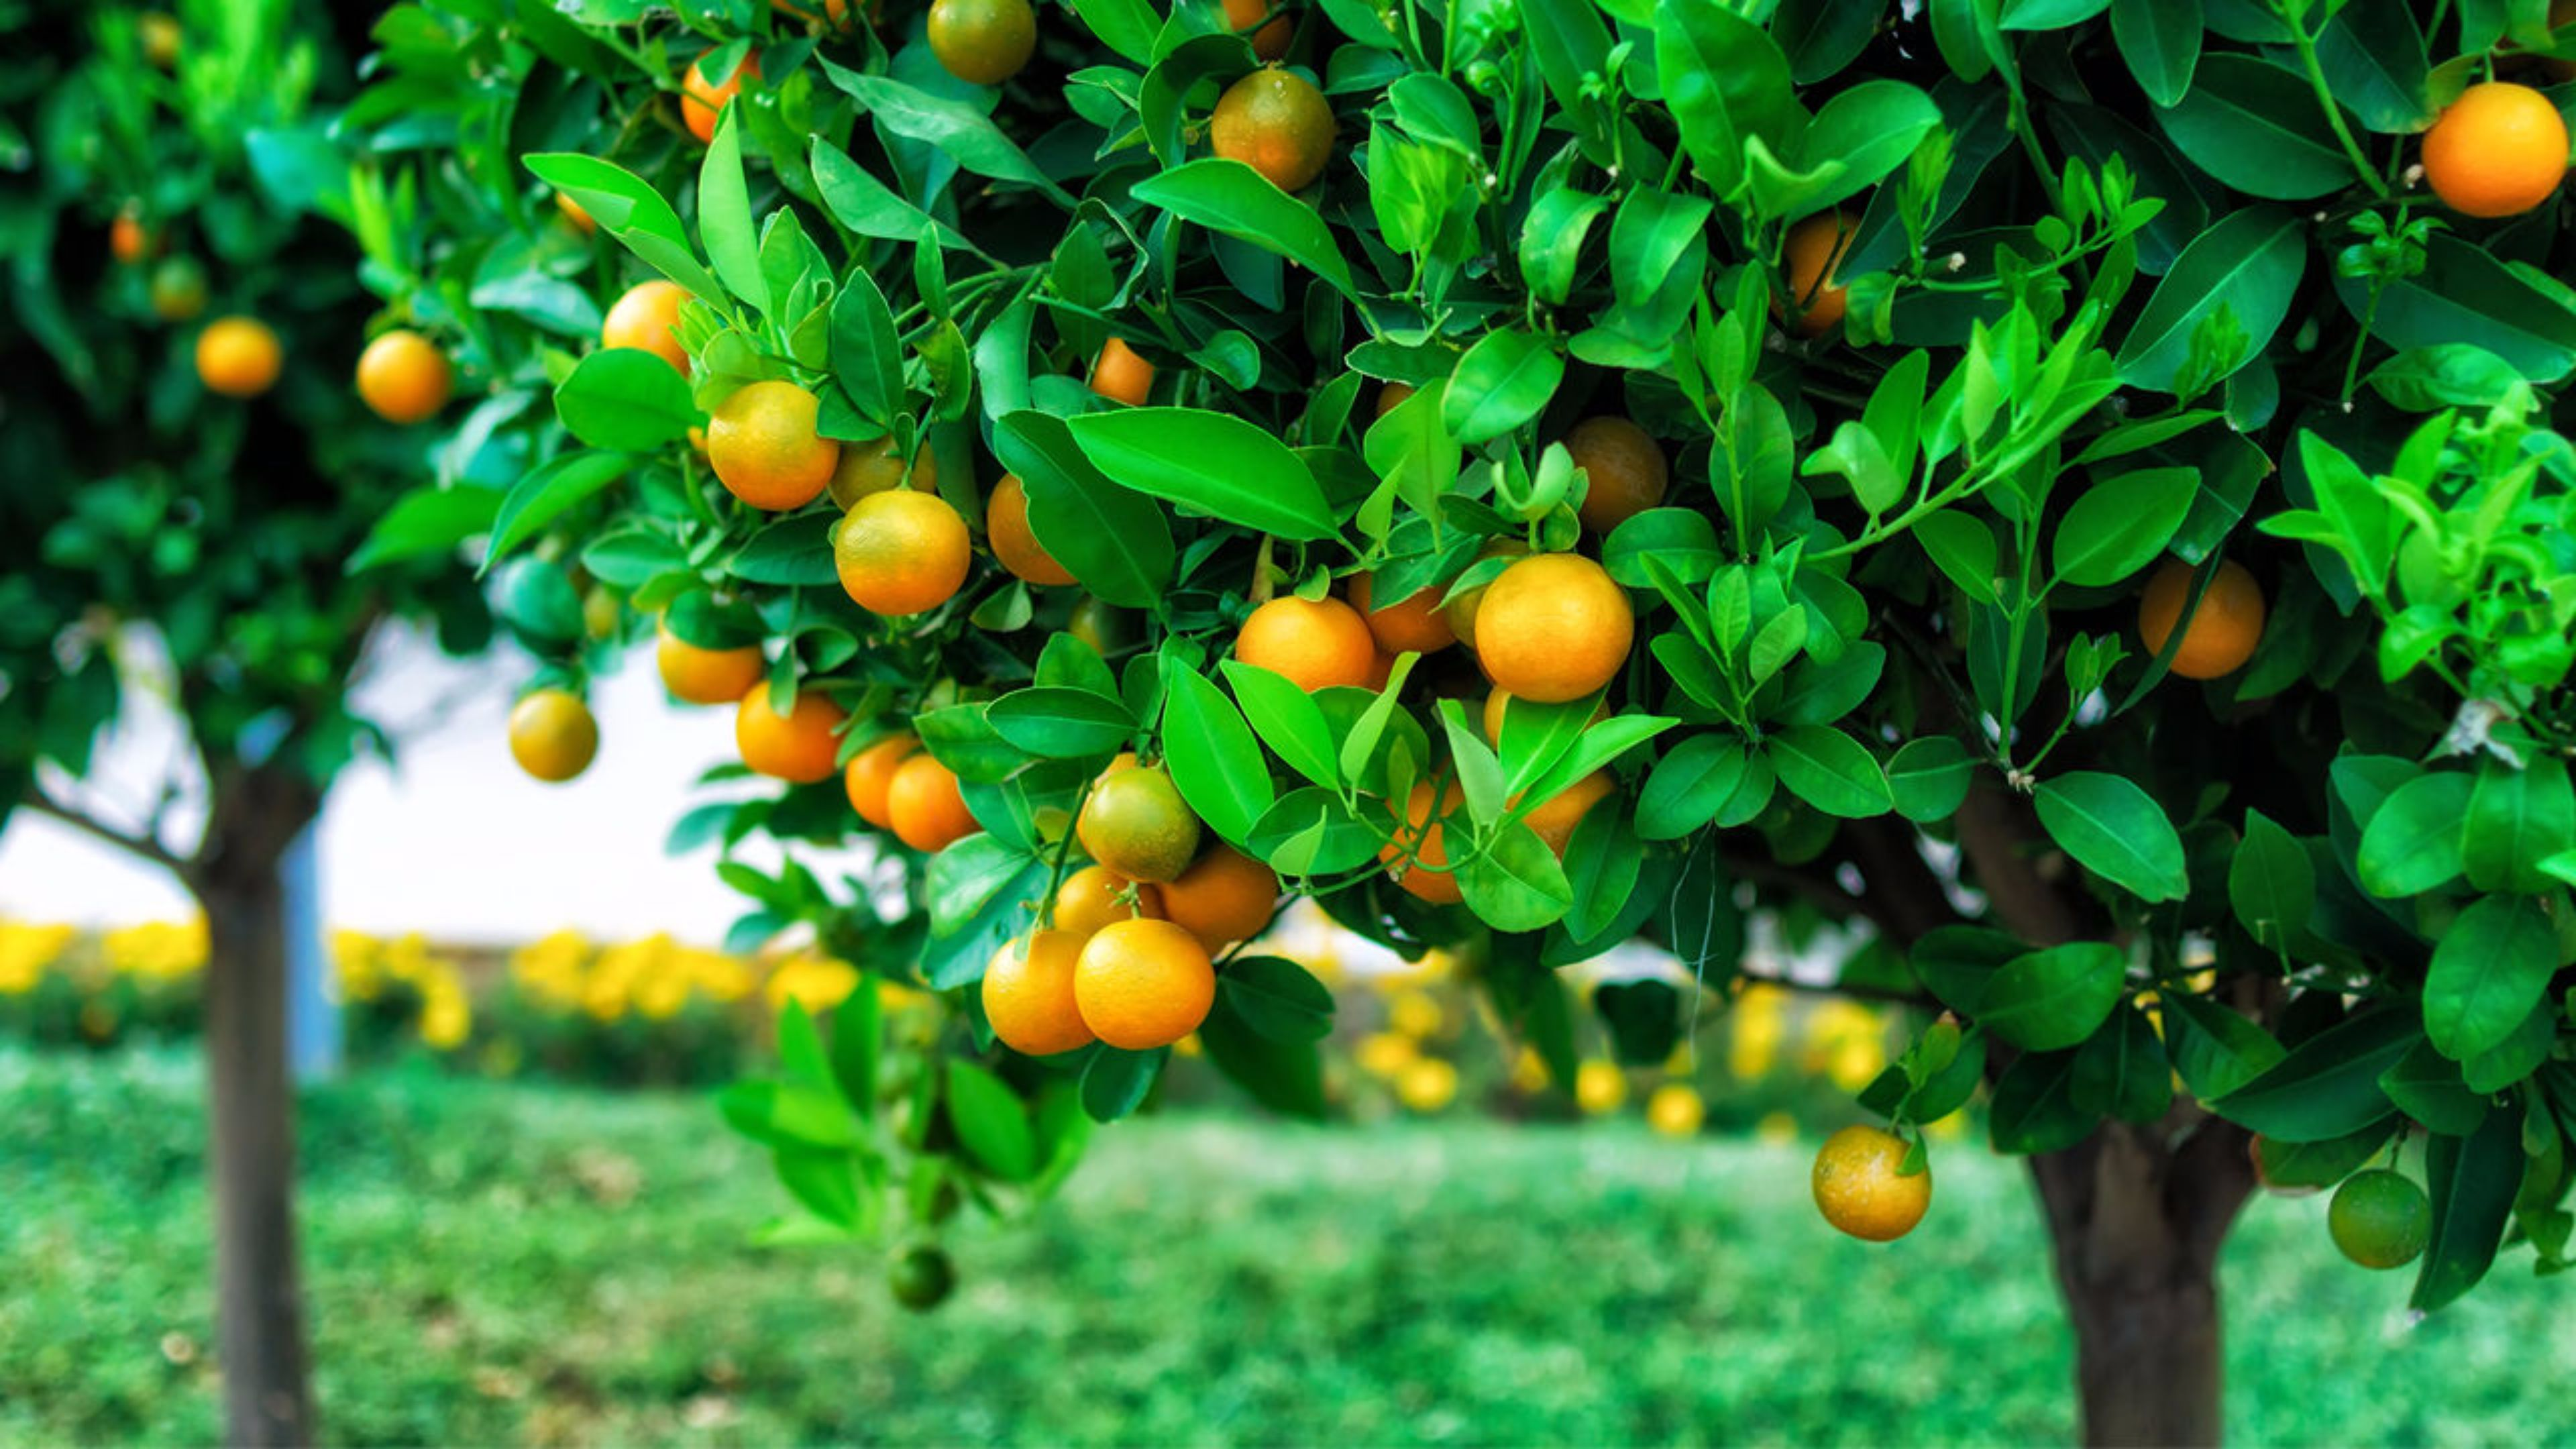 Fruit Tree Wallpapers   Top Fruit Tree Backgrounds 3840x2160